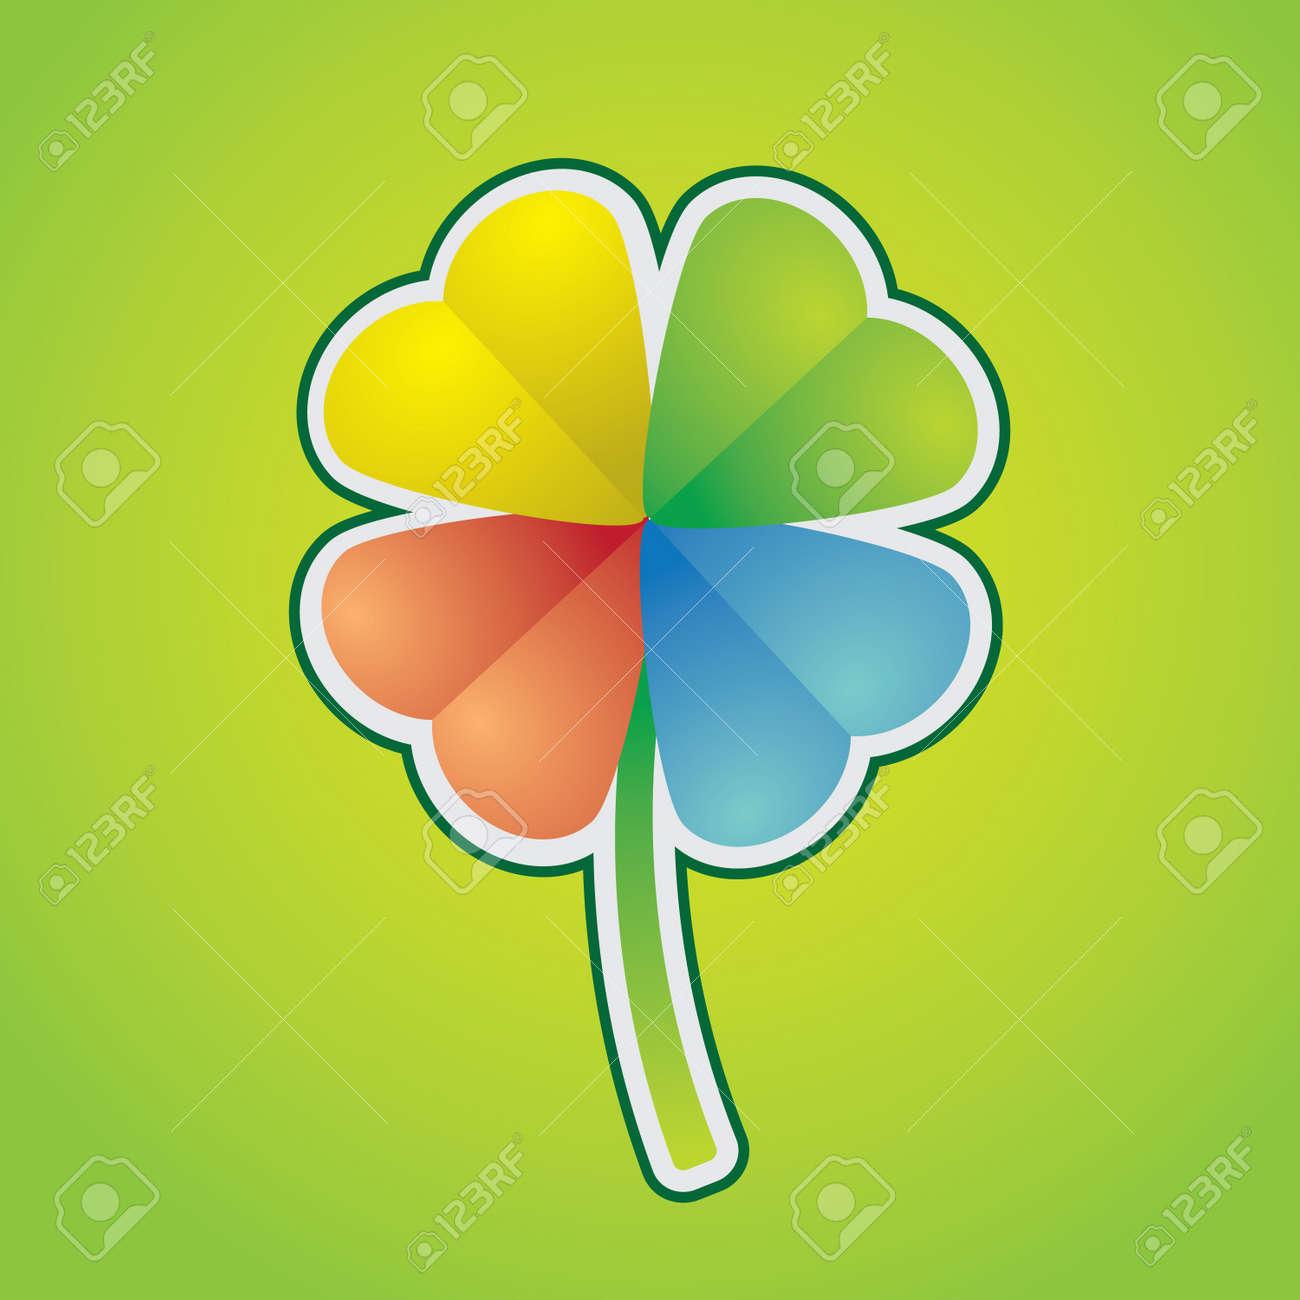 multicolored four-leaf clover - illustration Stock Vector - 12454681